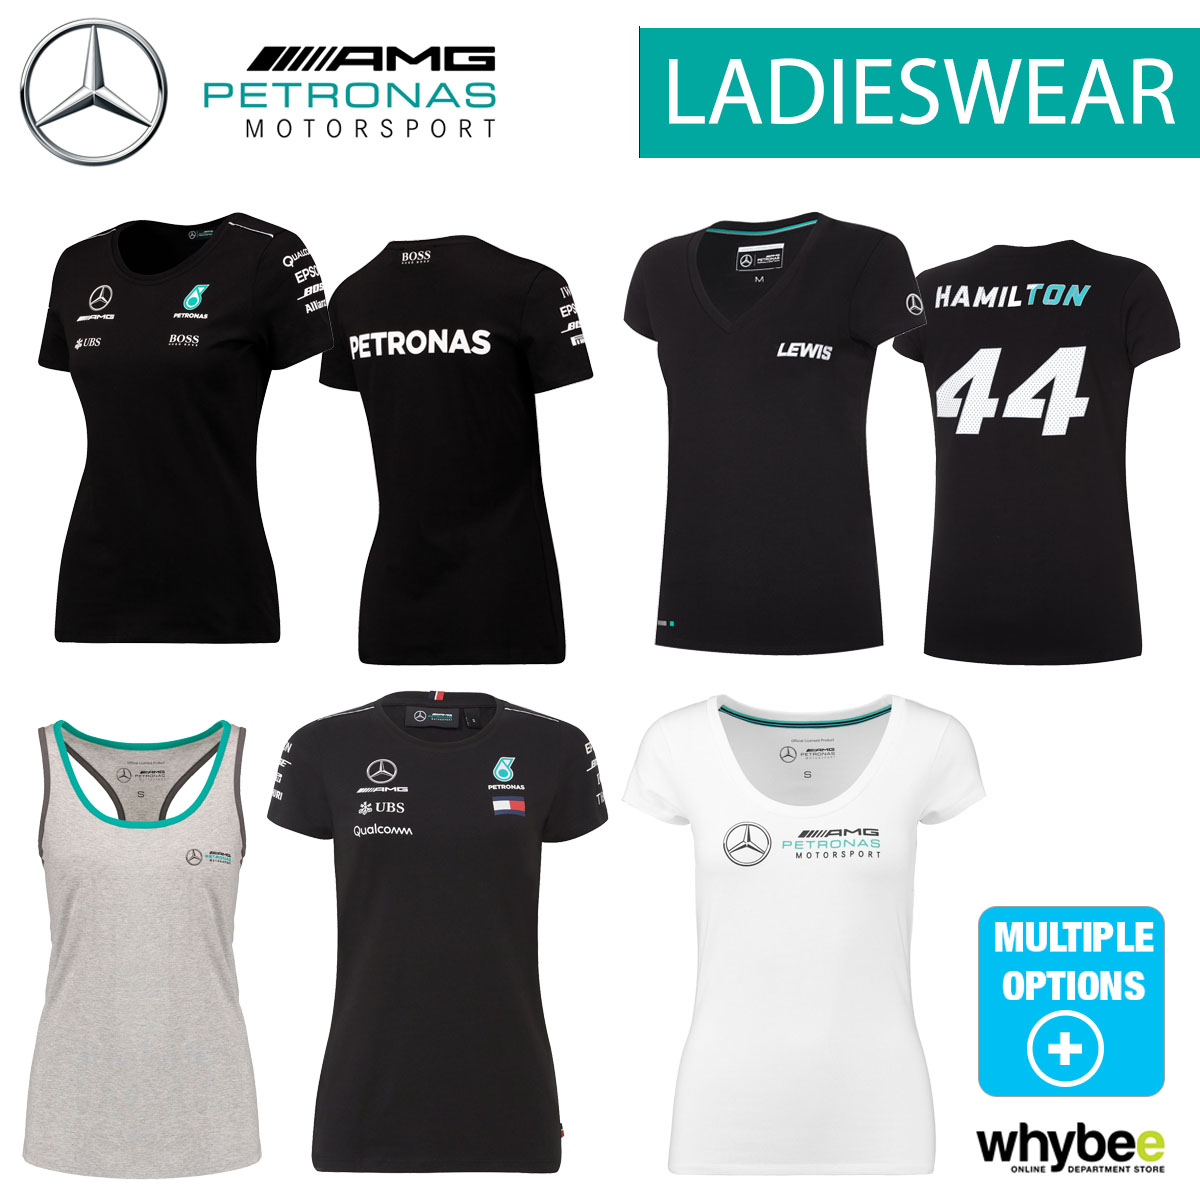 4e98dd7df943 Sentinel Official Mercedes F1 Formula One Team Ladieswear Womens T-Shirts  Polo Clothing